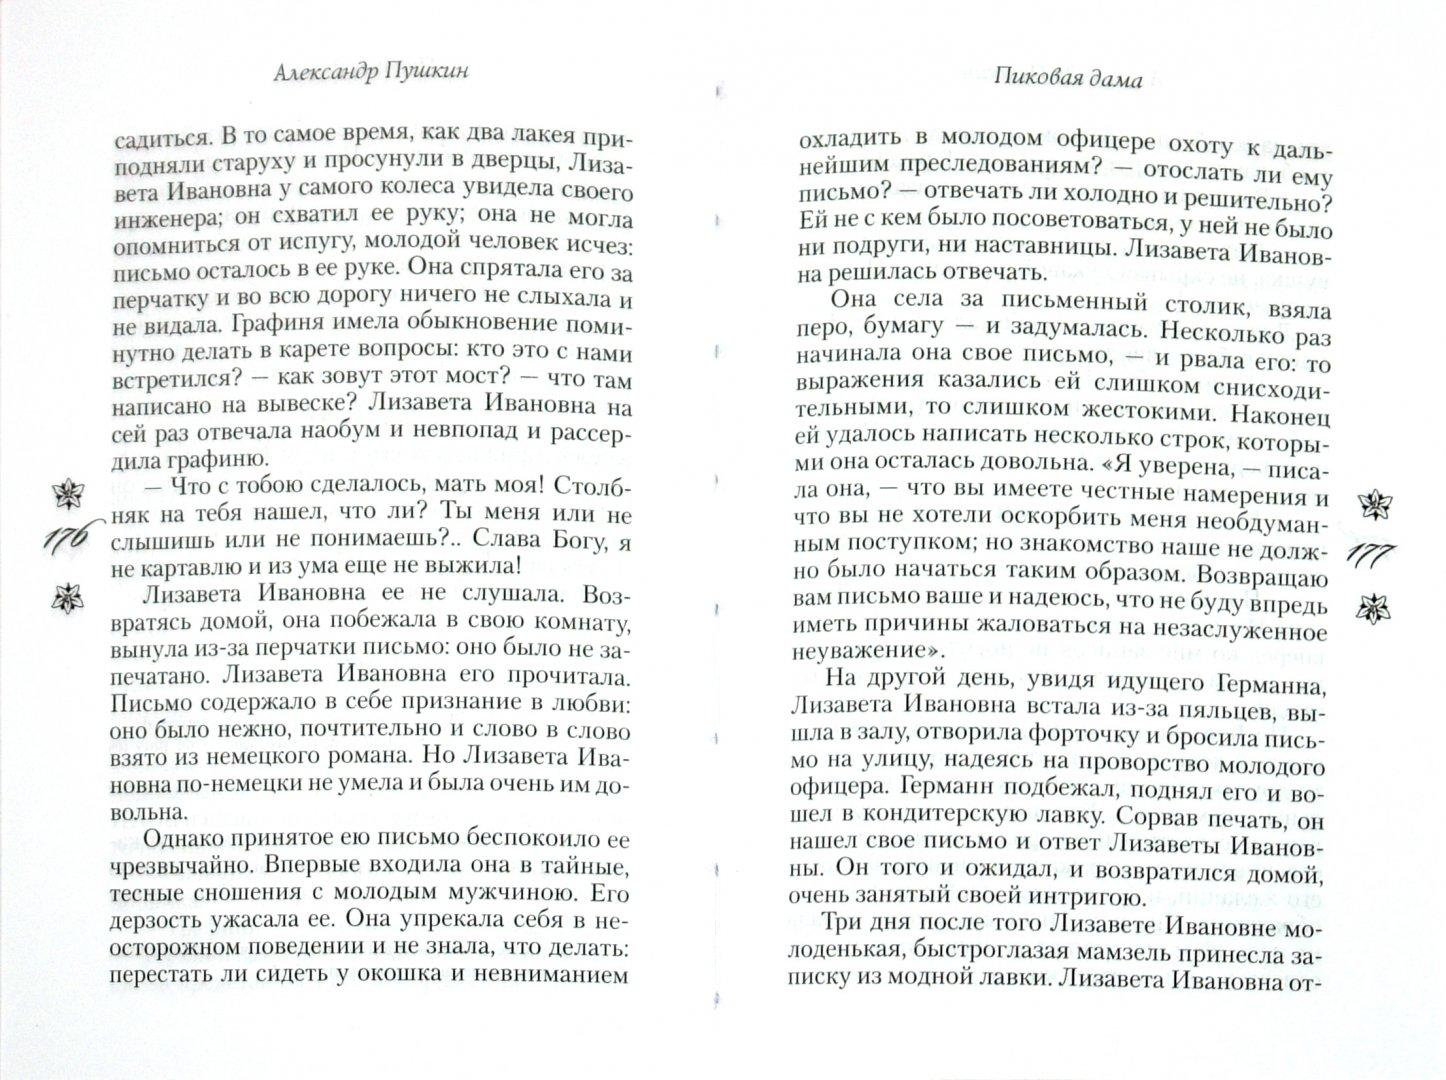 Иллюстрация 1 из 12 для Барышня-крестьянка - Александр Пушкин | Лабиринт - книги. Источник: Лабиринт